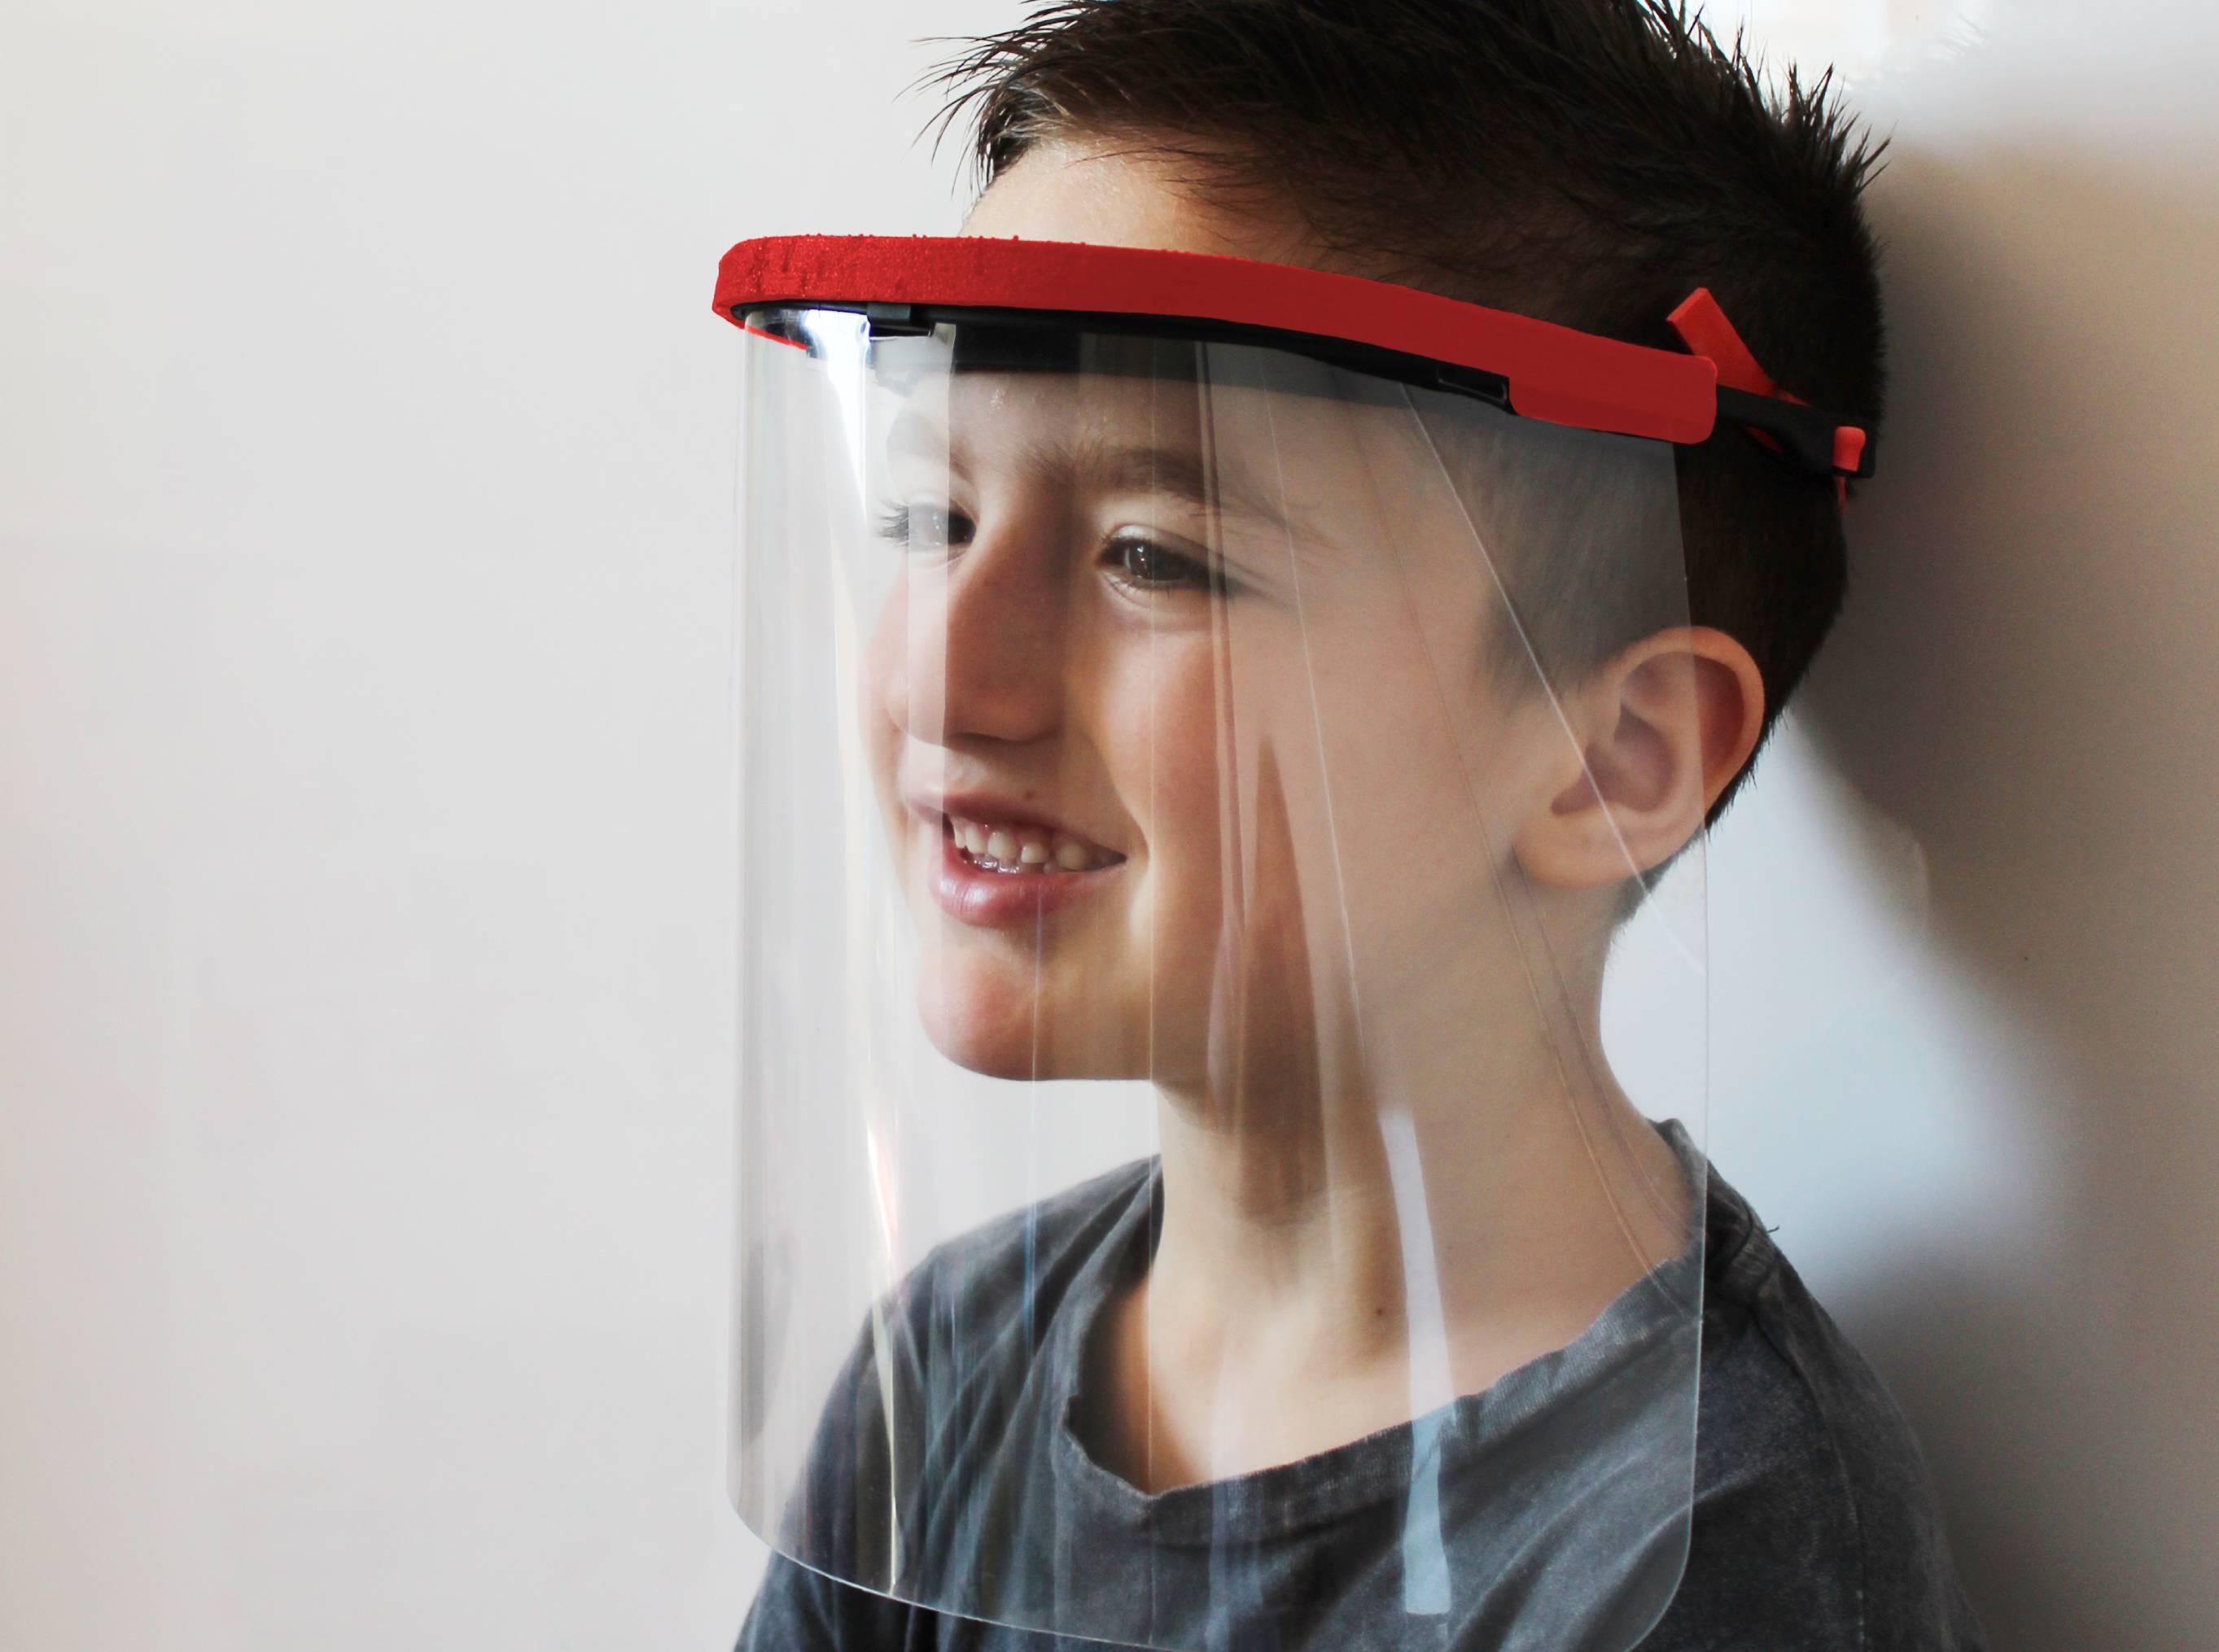 https://www.tayg.com/wp-content/uploads/2020/08/pantalla-proteccion-covid-para-niños.jpg